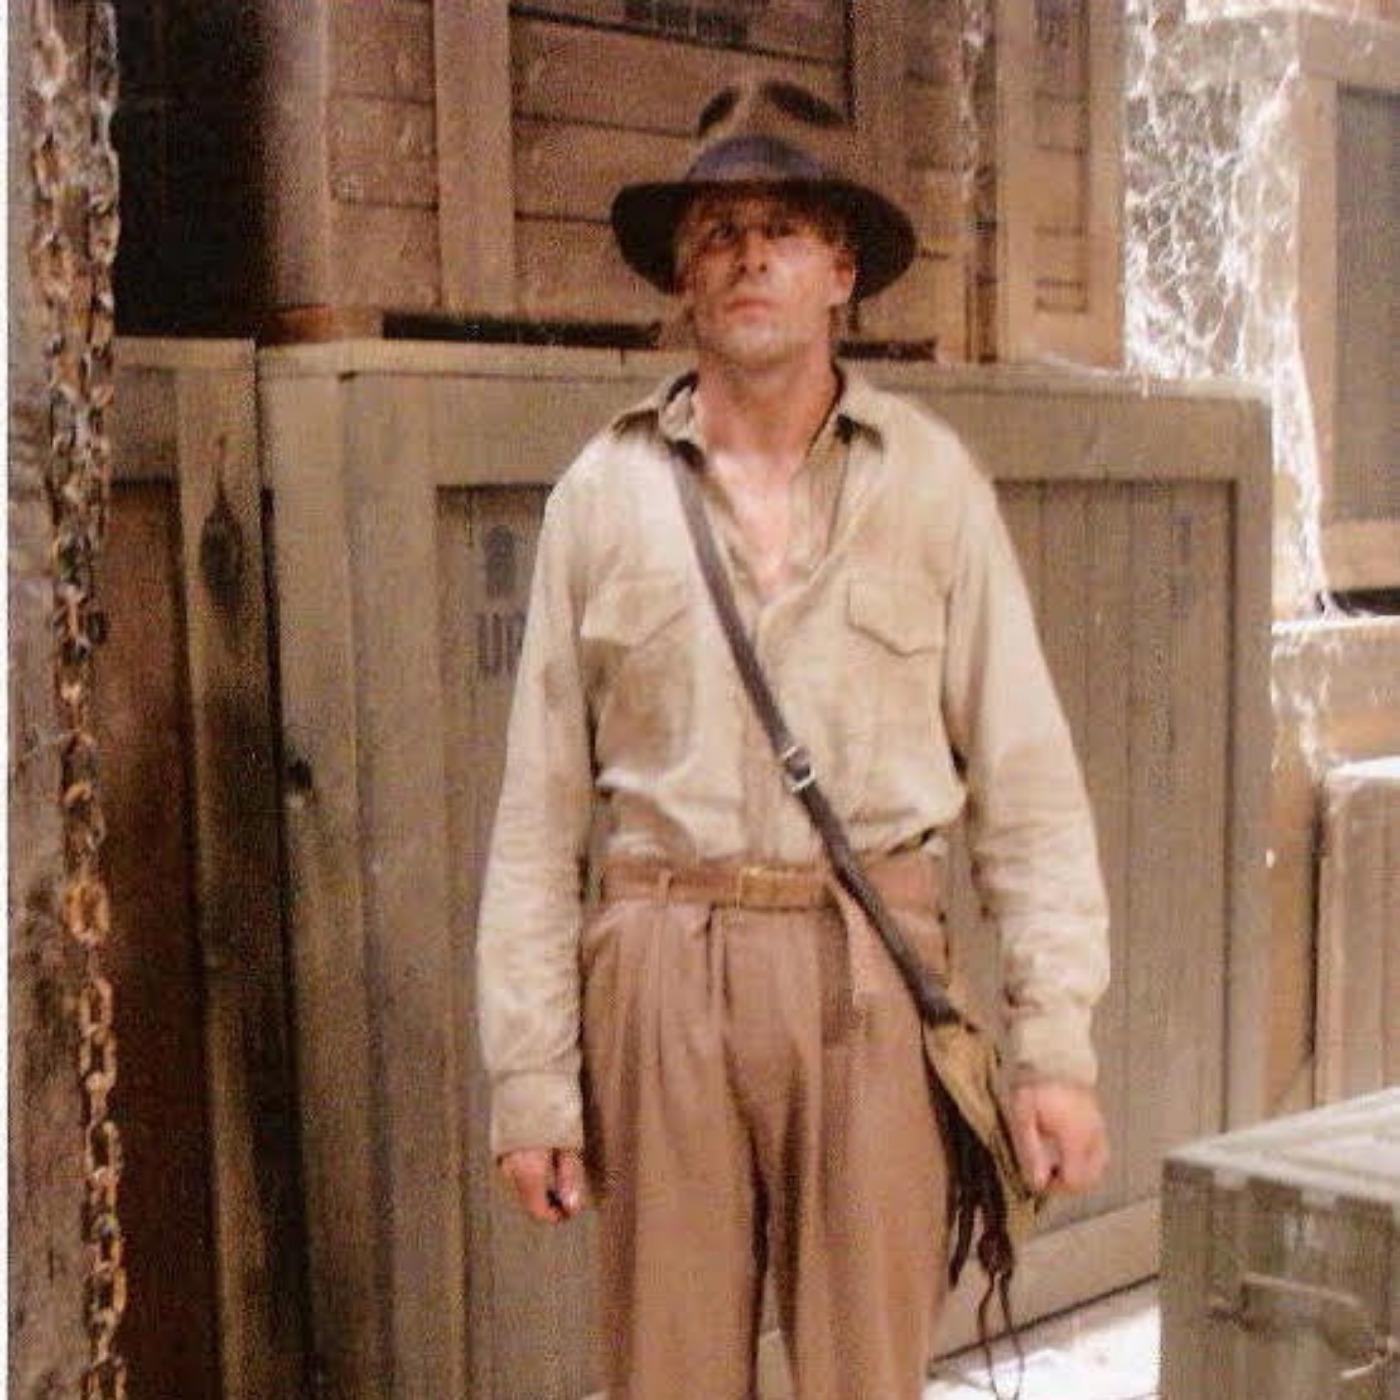 Indiana Jones Stunt Man & Spiritual Action Guide: Carl Rice